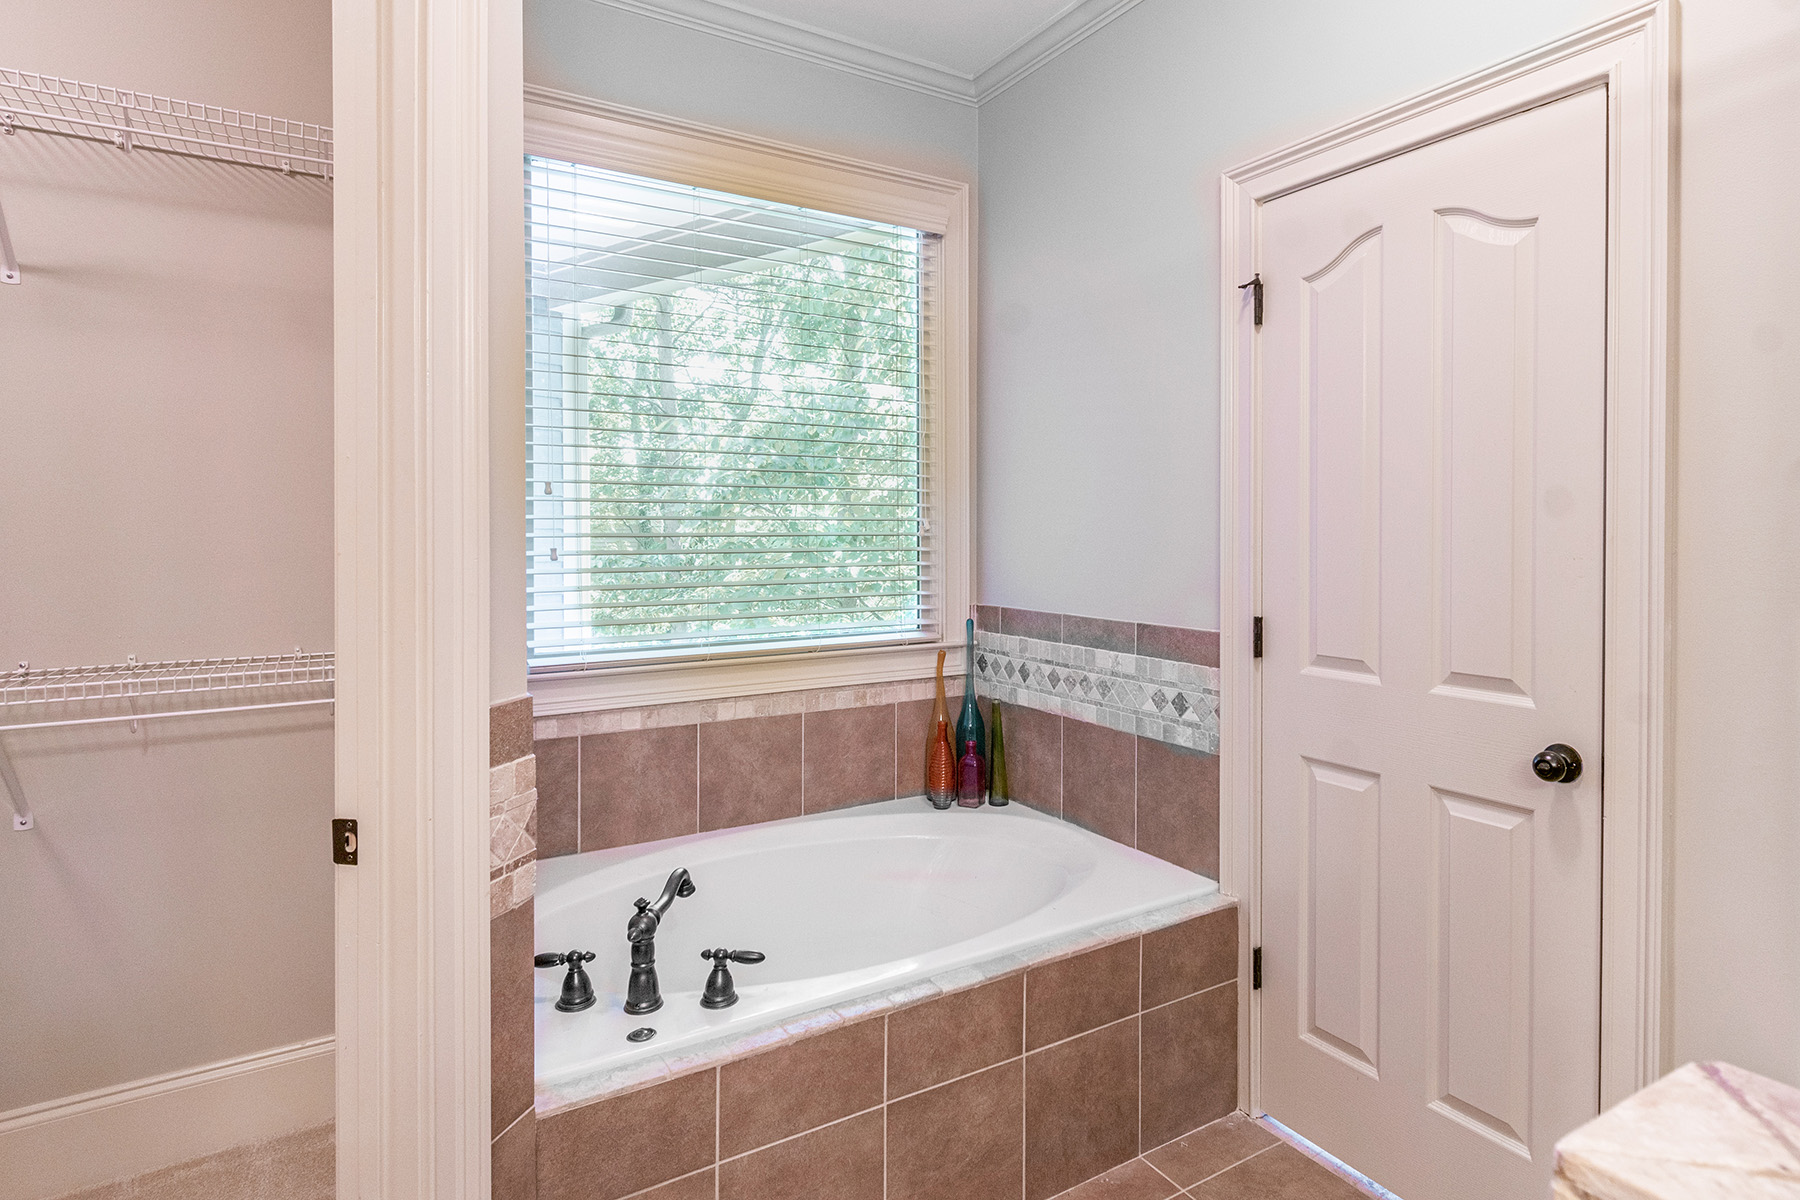 Additional photo for property listing at Pristine Cape Cod In Gated Georgia Mountain Community 188 Bluestern Drive SE, Big Canoe, Georgia 30143 Stati Uniti